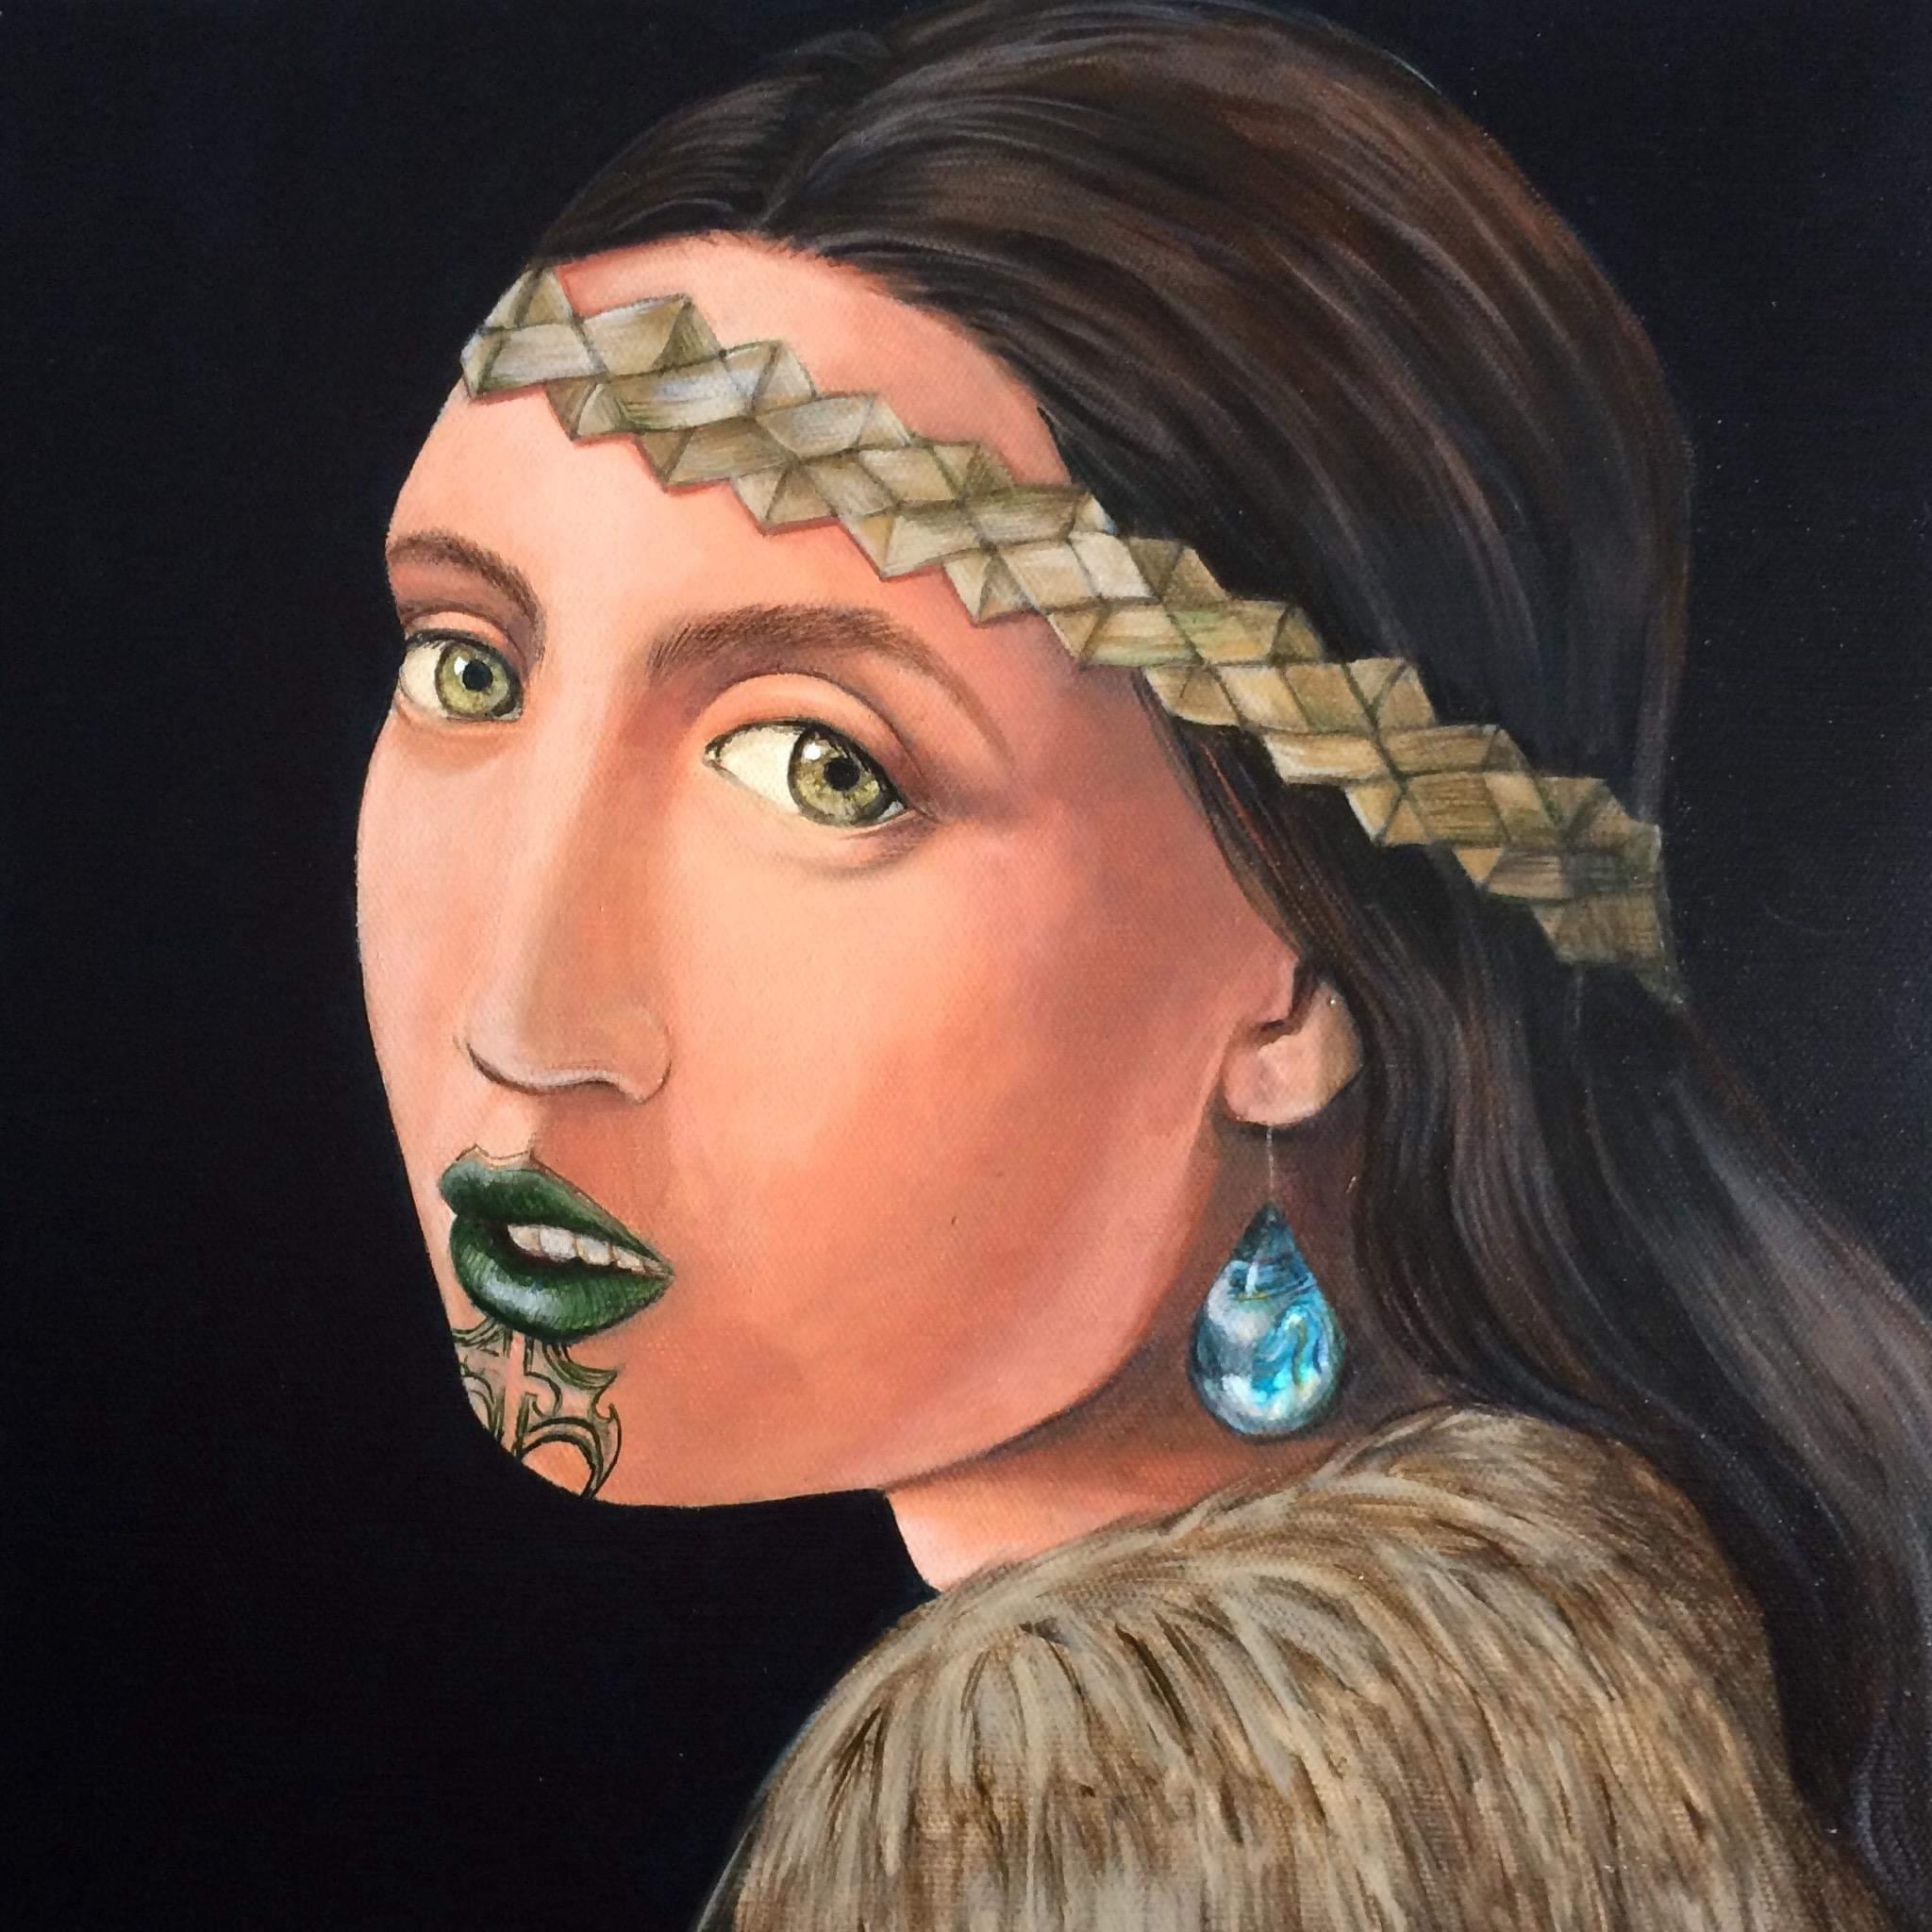 Girl With The Paua Earring 2